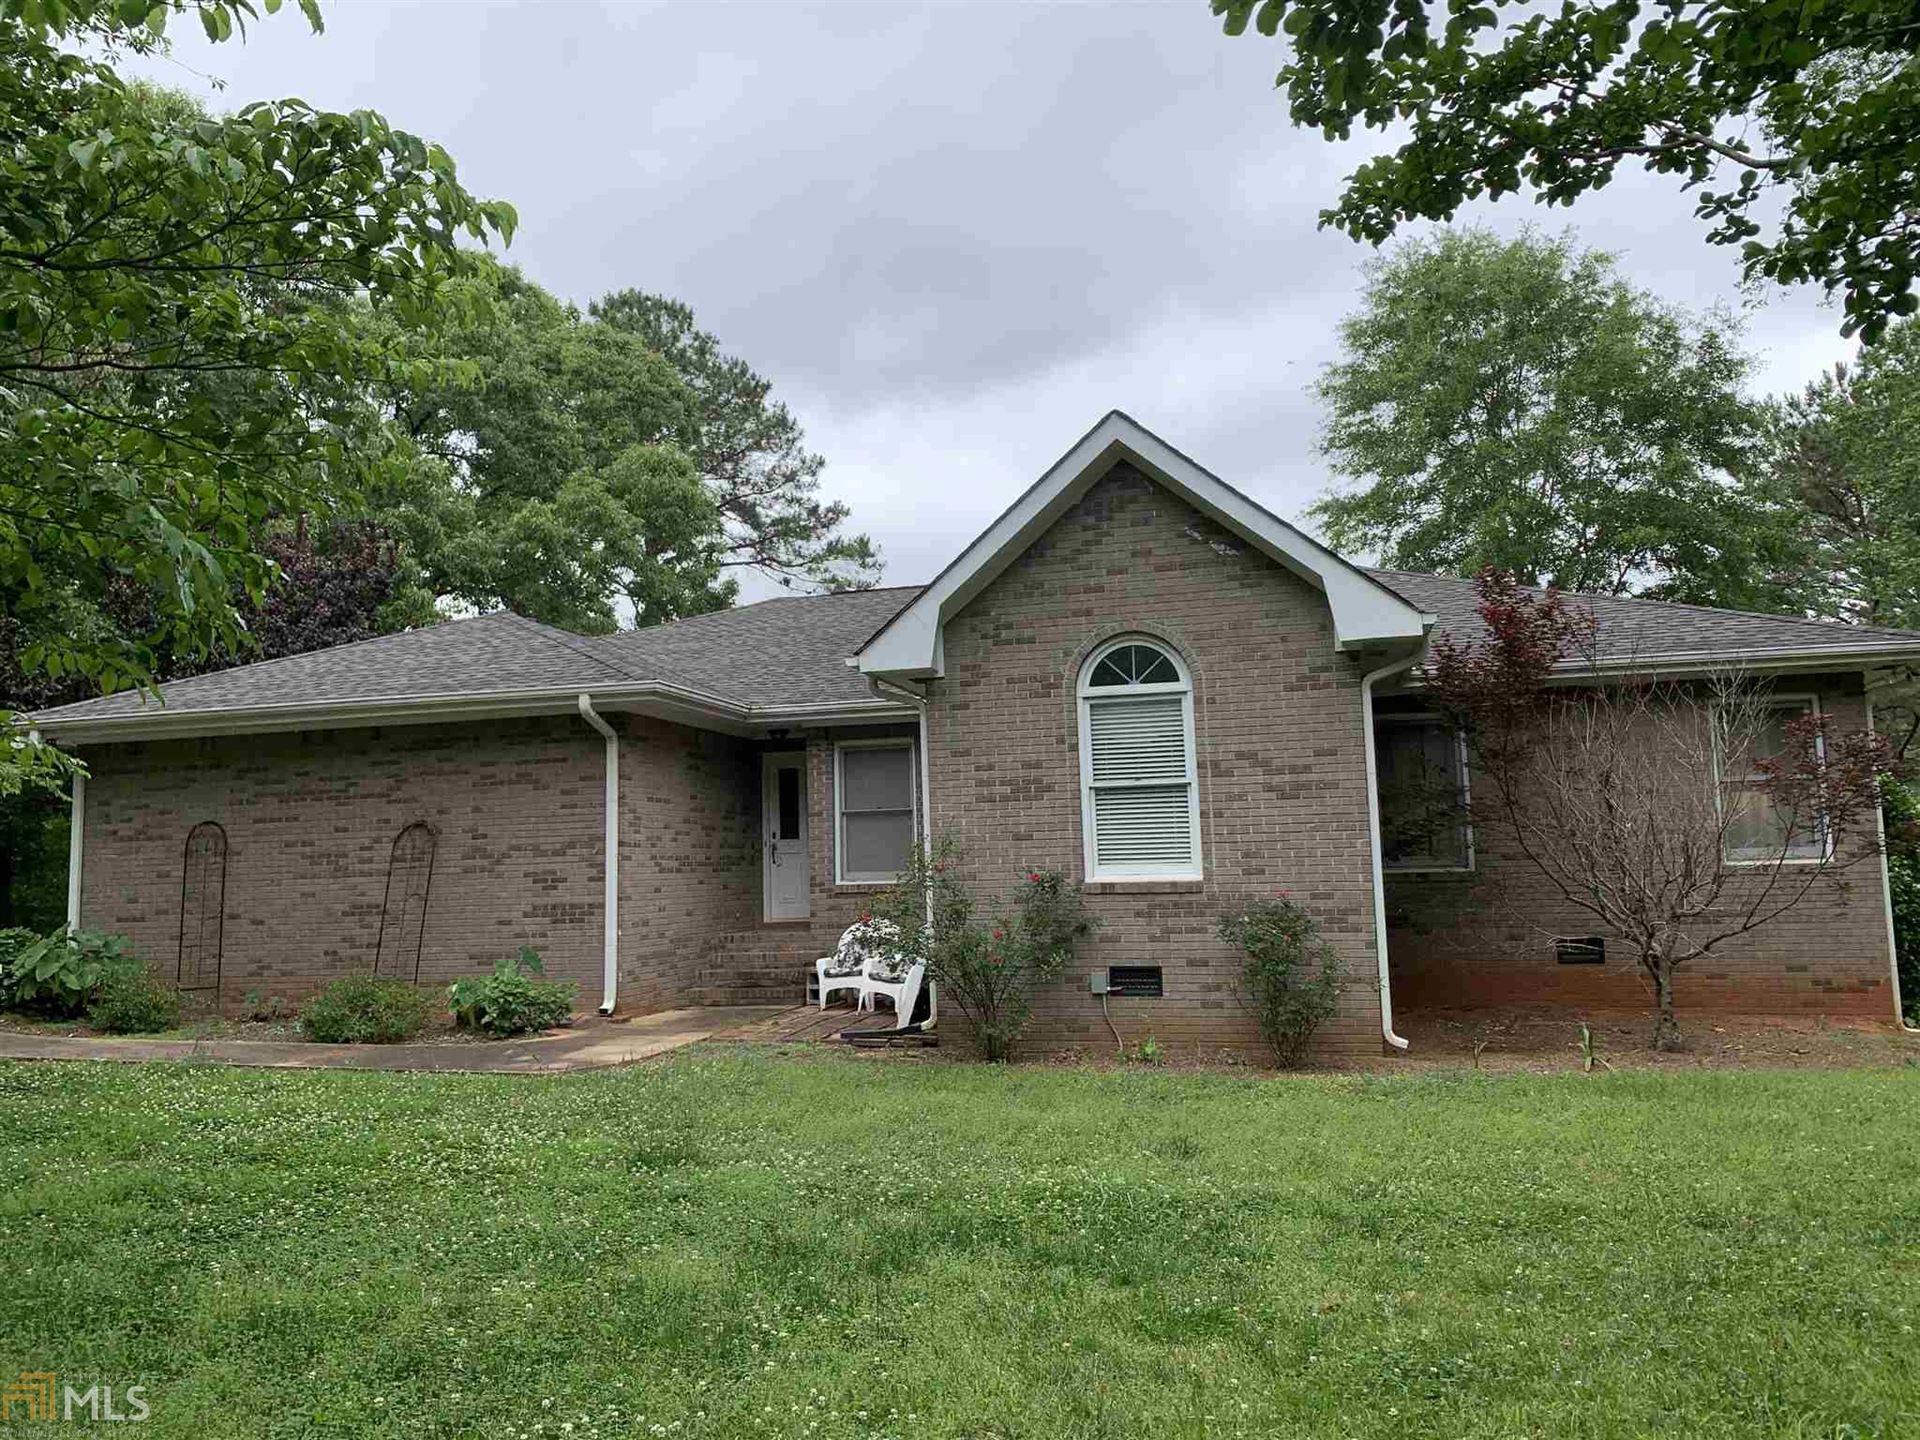 610 Ralls Rd, Hogansville, GA 30230 - #: 8791097